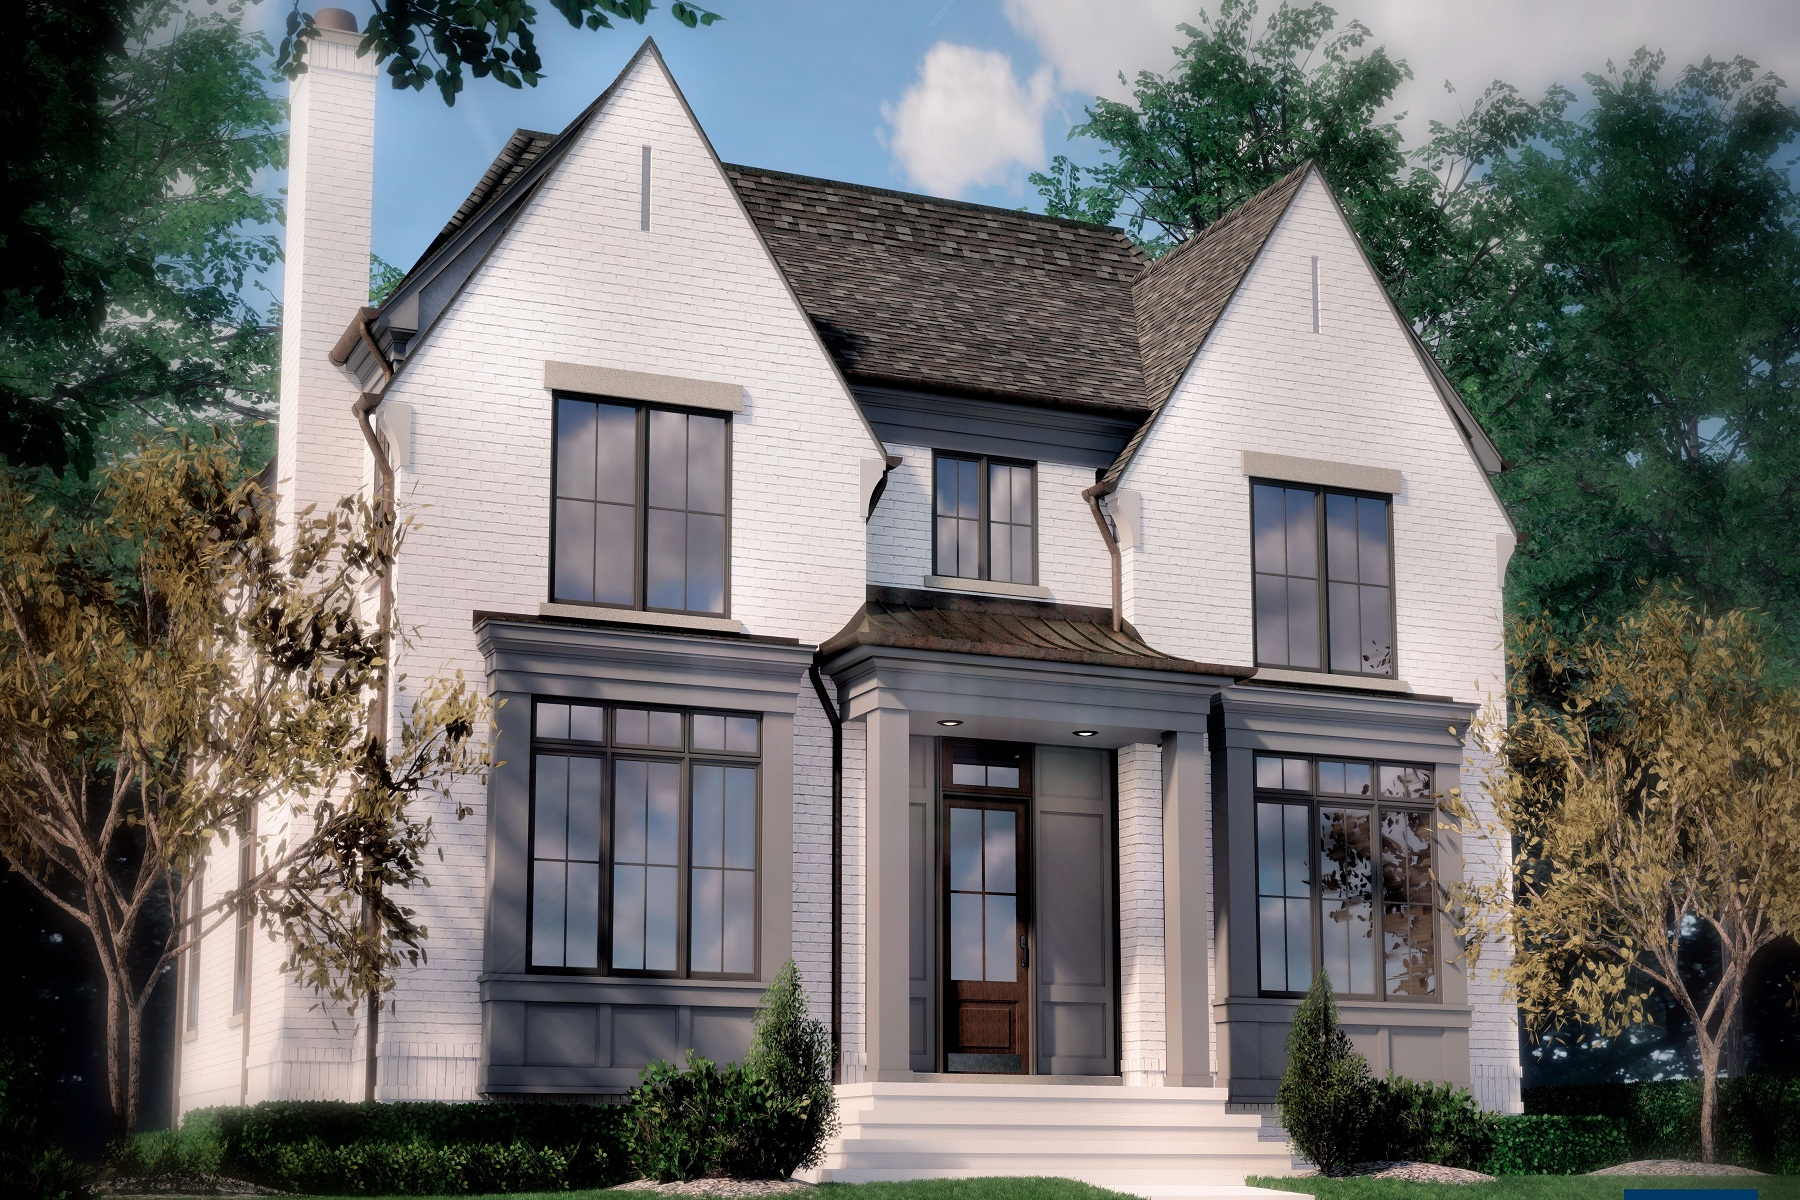 Single Family Homes for Sale at Birmingham 608 Stanley Blvd. Birmingham, Michigan 48009 United States